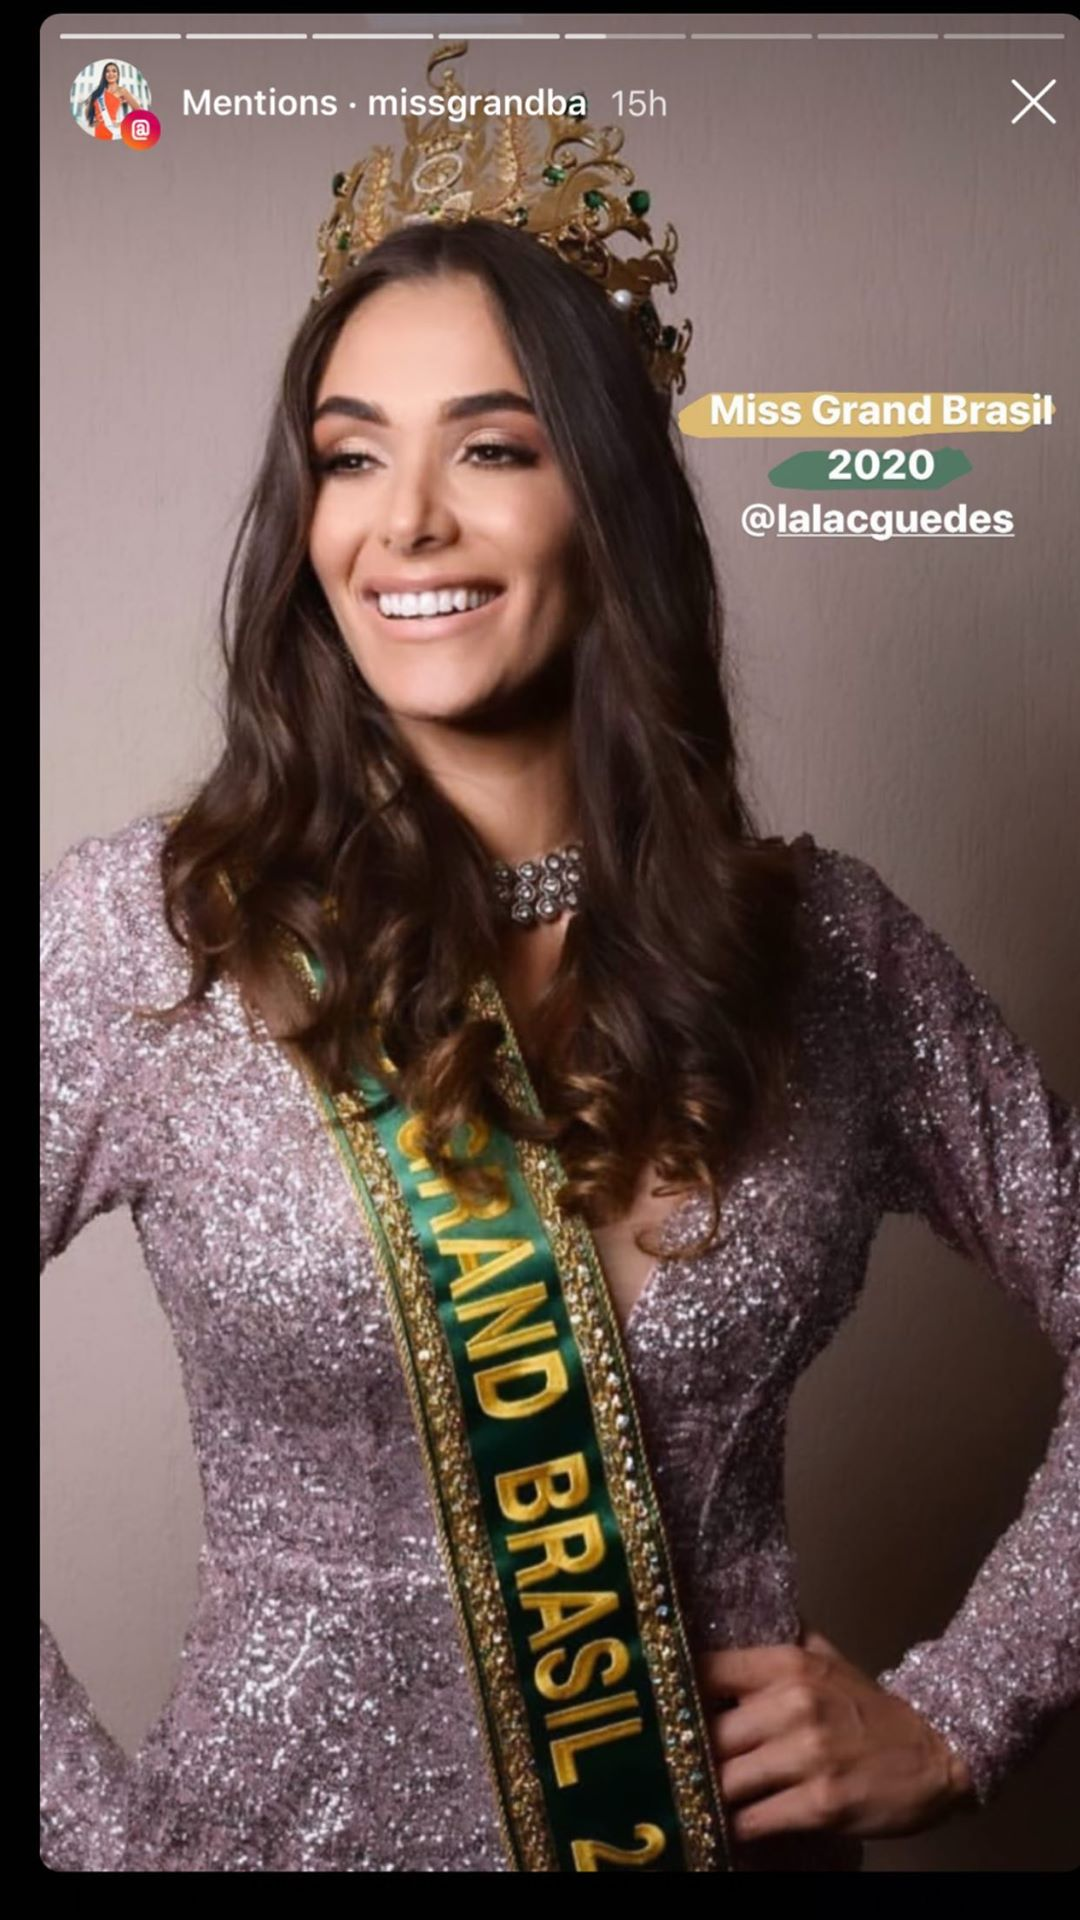 lala guedes, miss grand brasil 2020. - Página 7 89938710